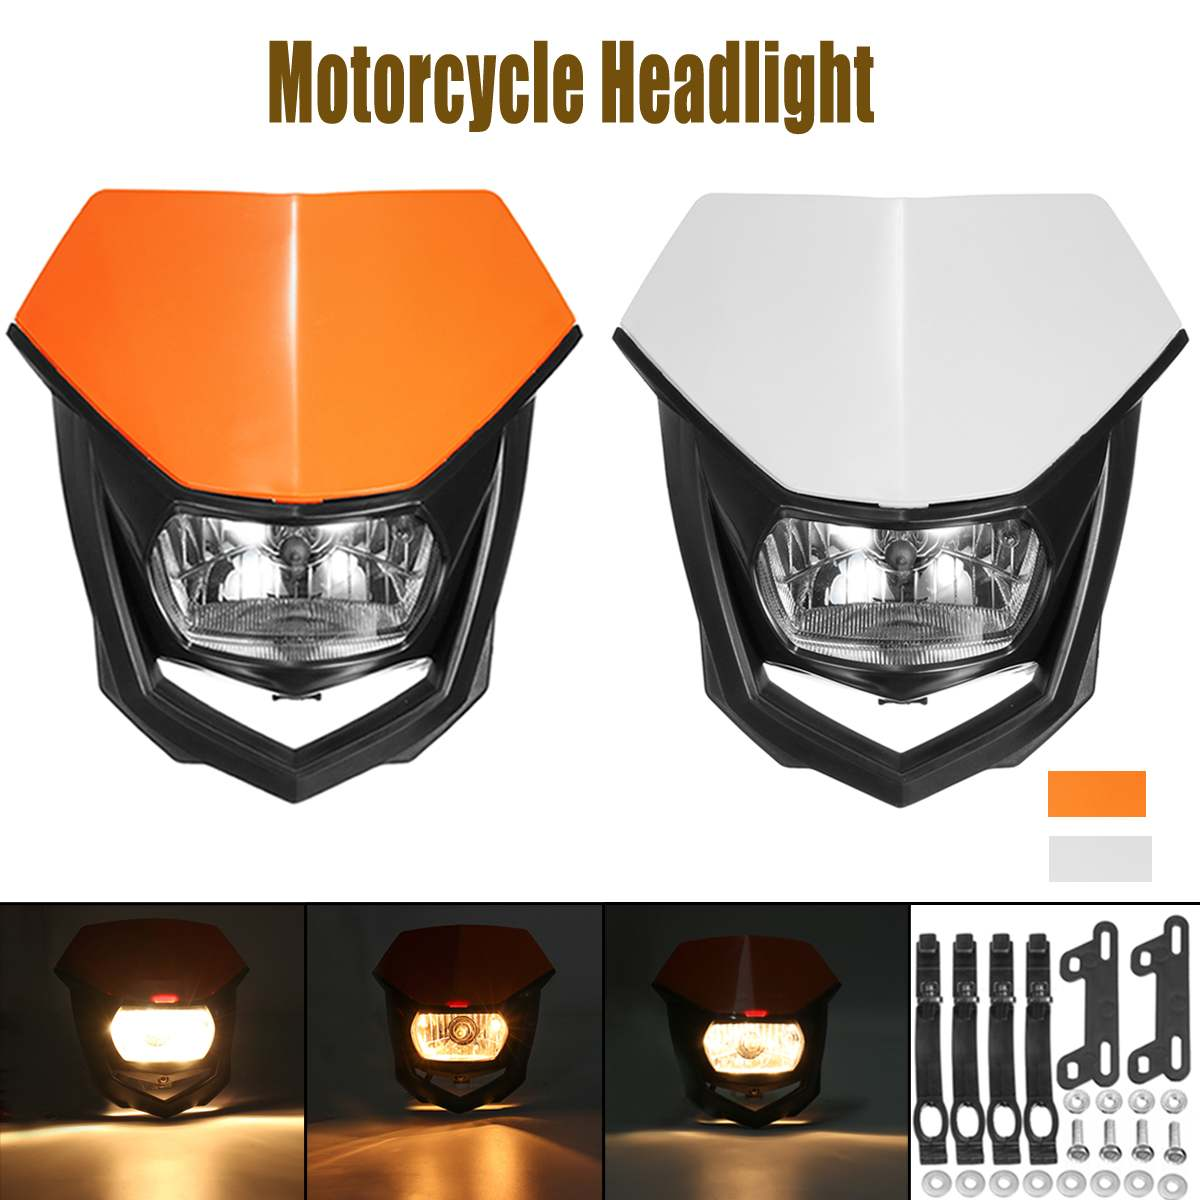 Universal Motorcycle 12V H4 Headlight Bulbs Headlamp  Dirt Bike Motorcycle Enduro Head Lamp